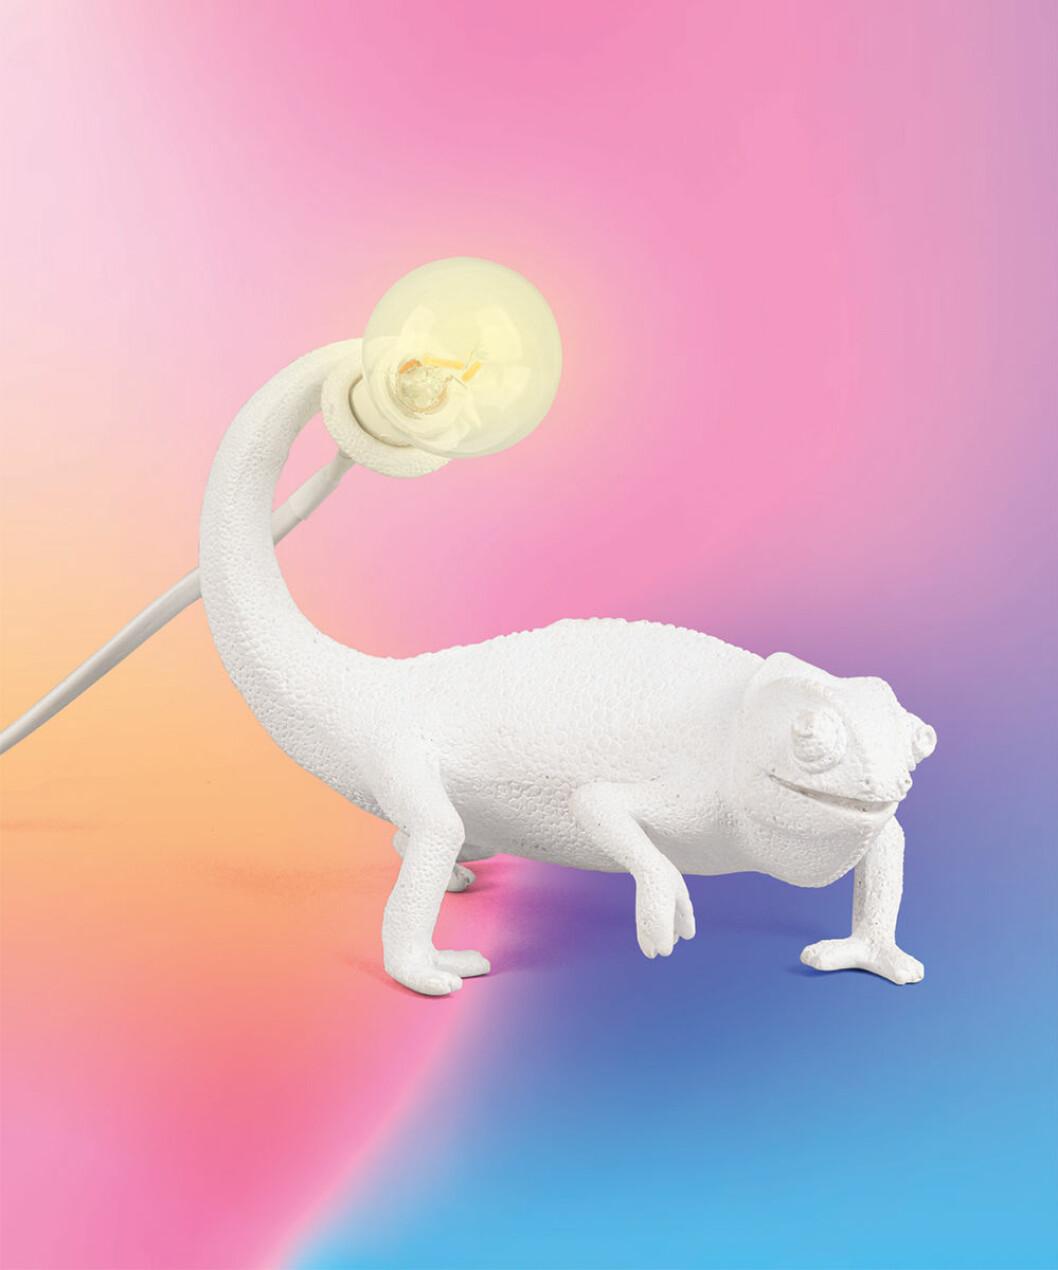 Kameleont-lampa från Seletti